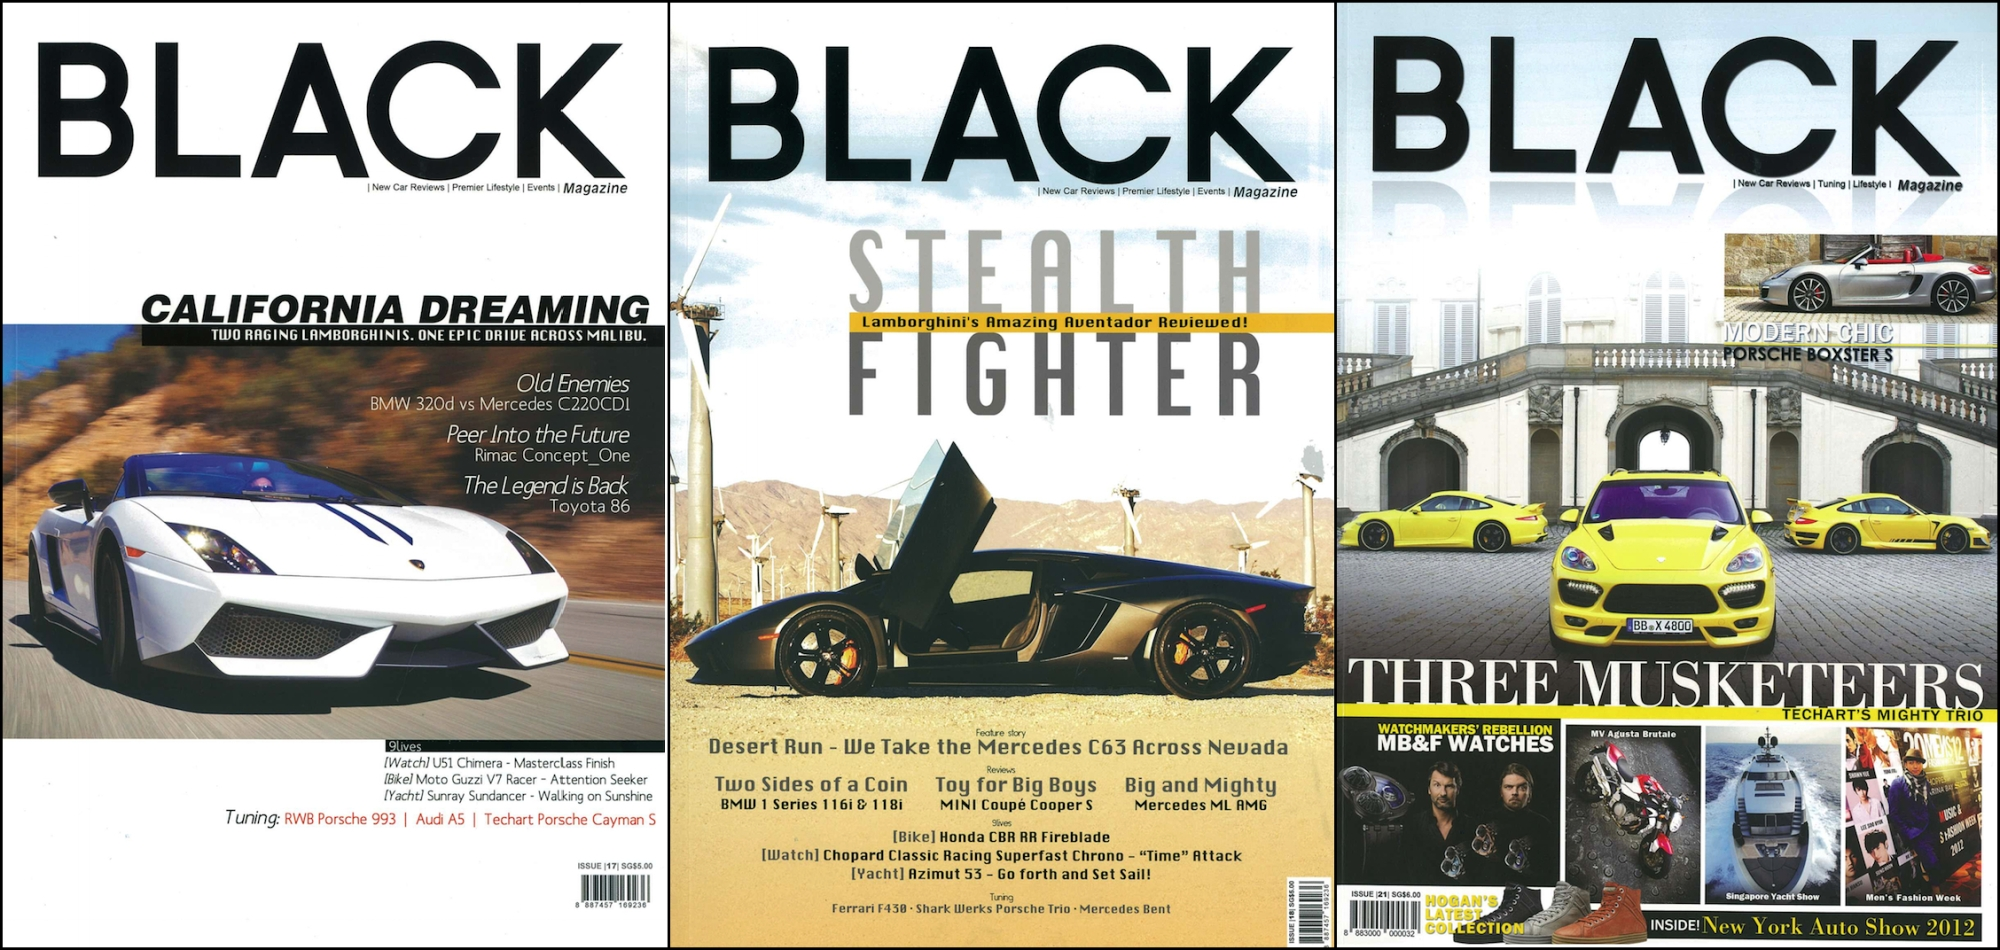 9tro Magazine Cover 2.jpg